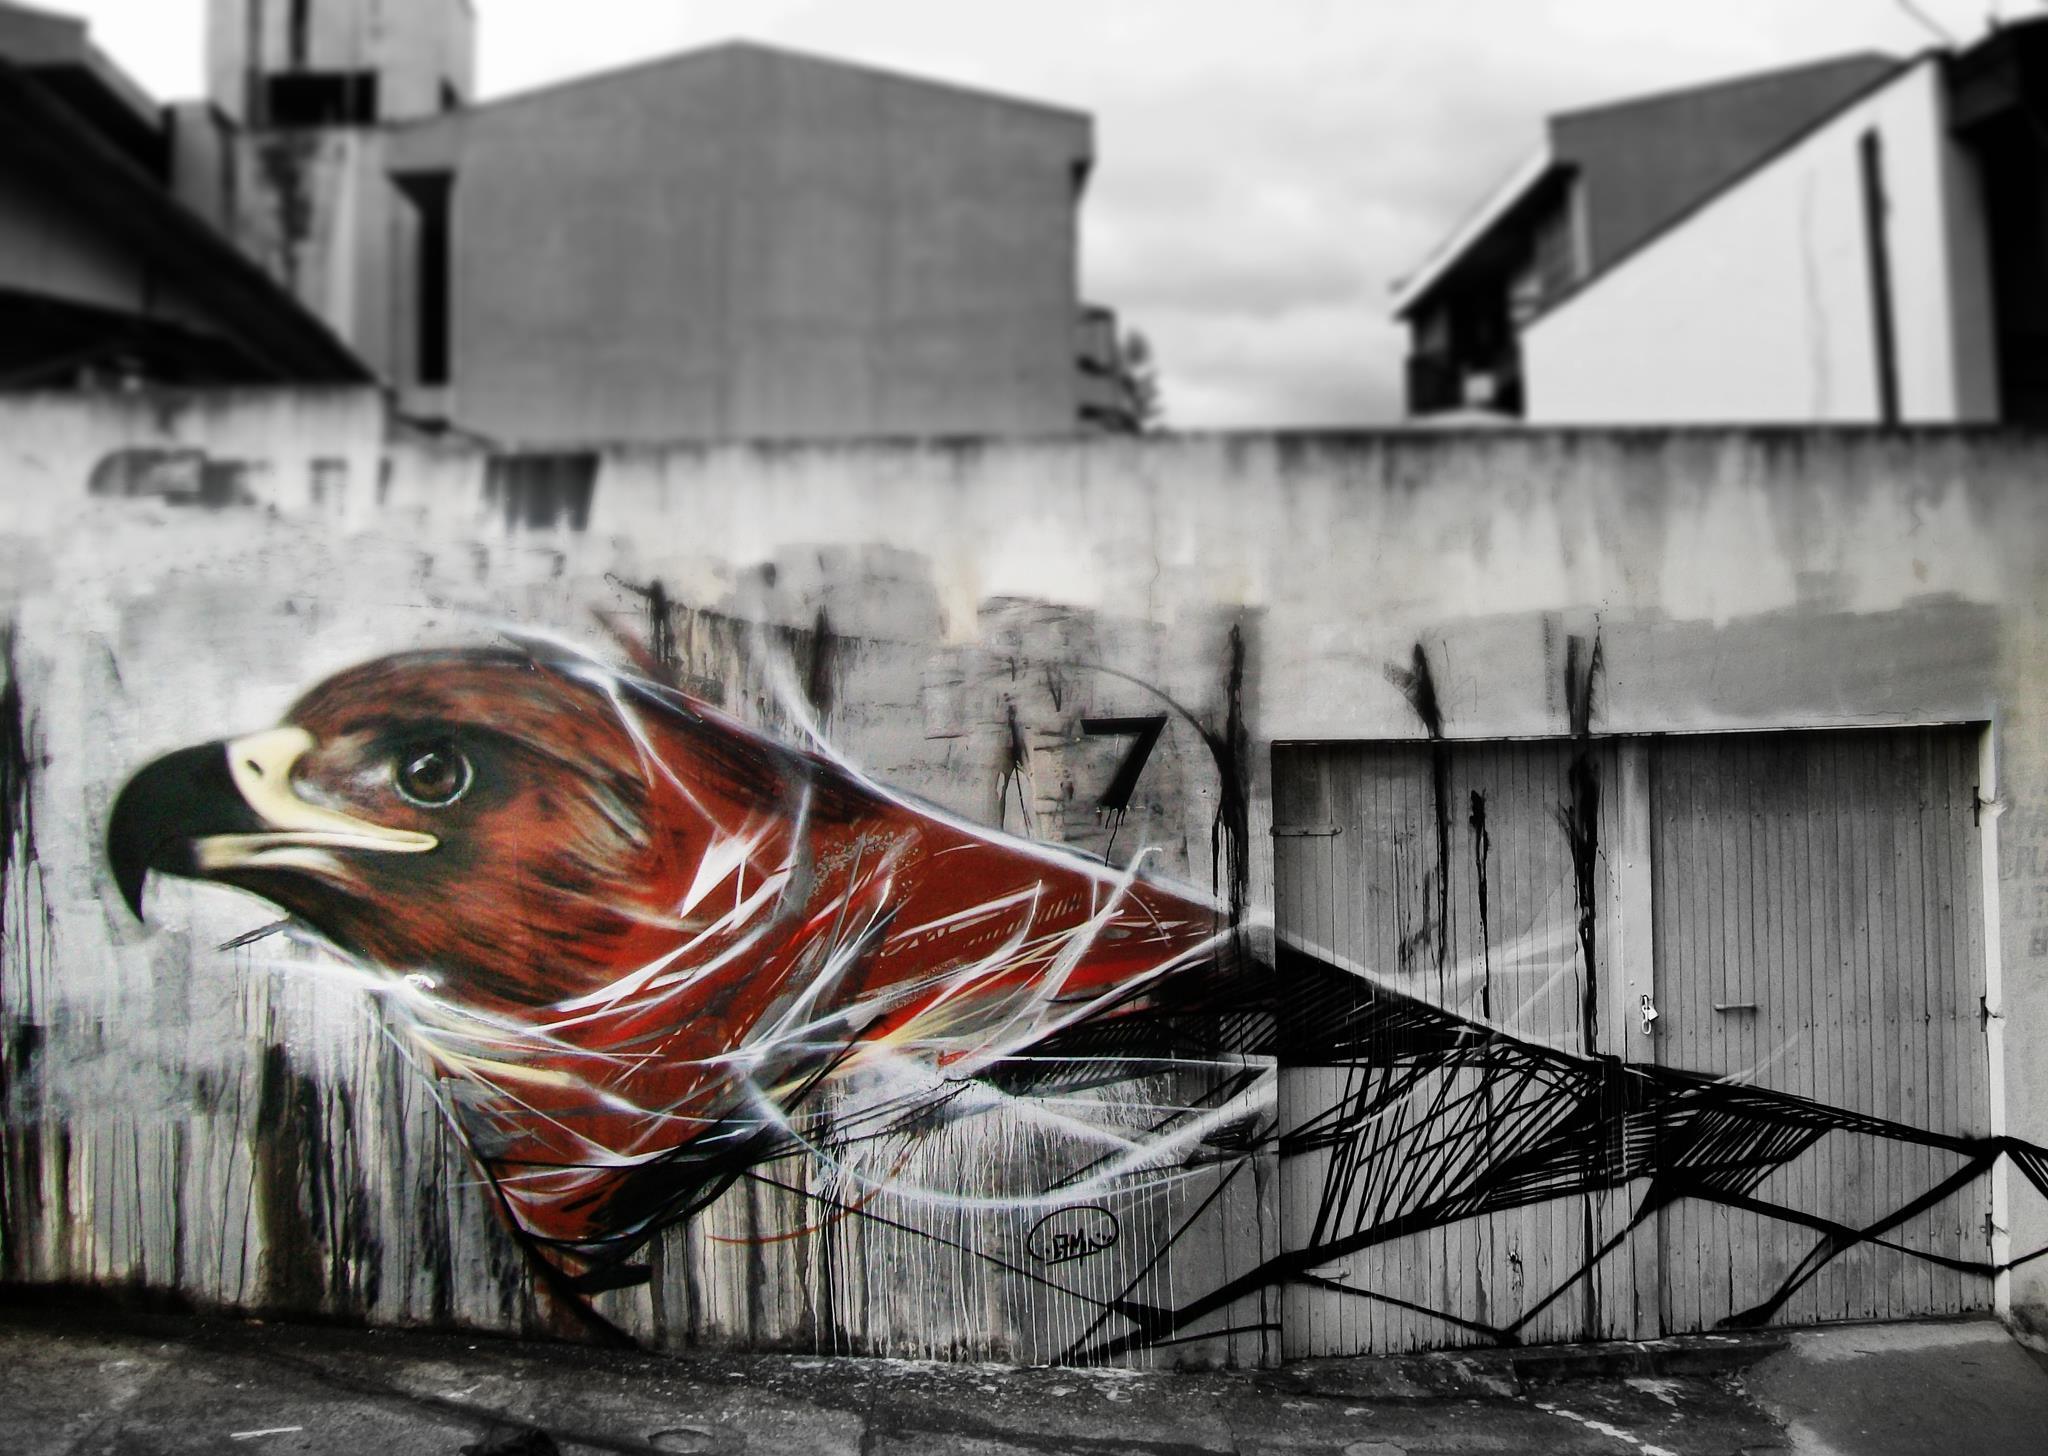 Street Art by L7m 18